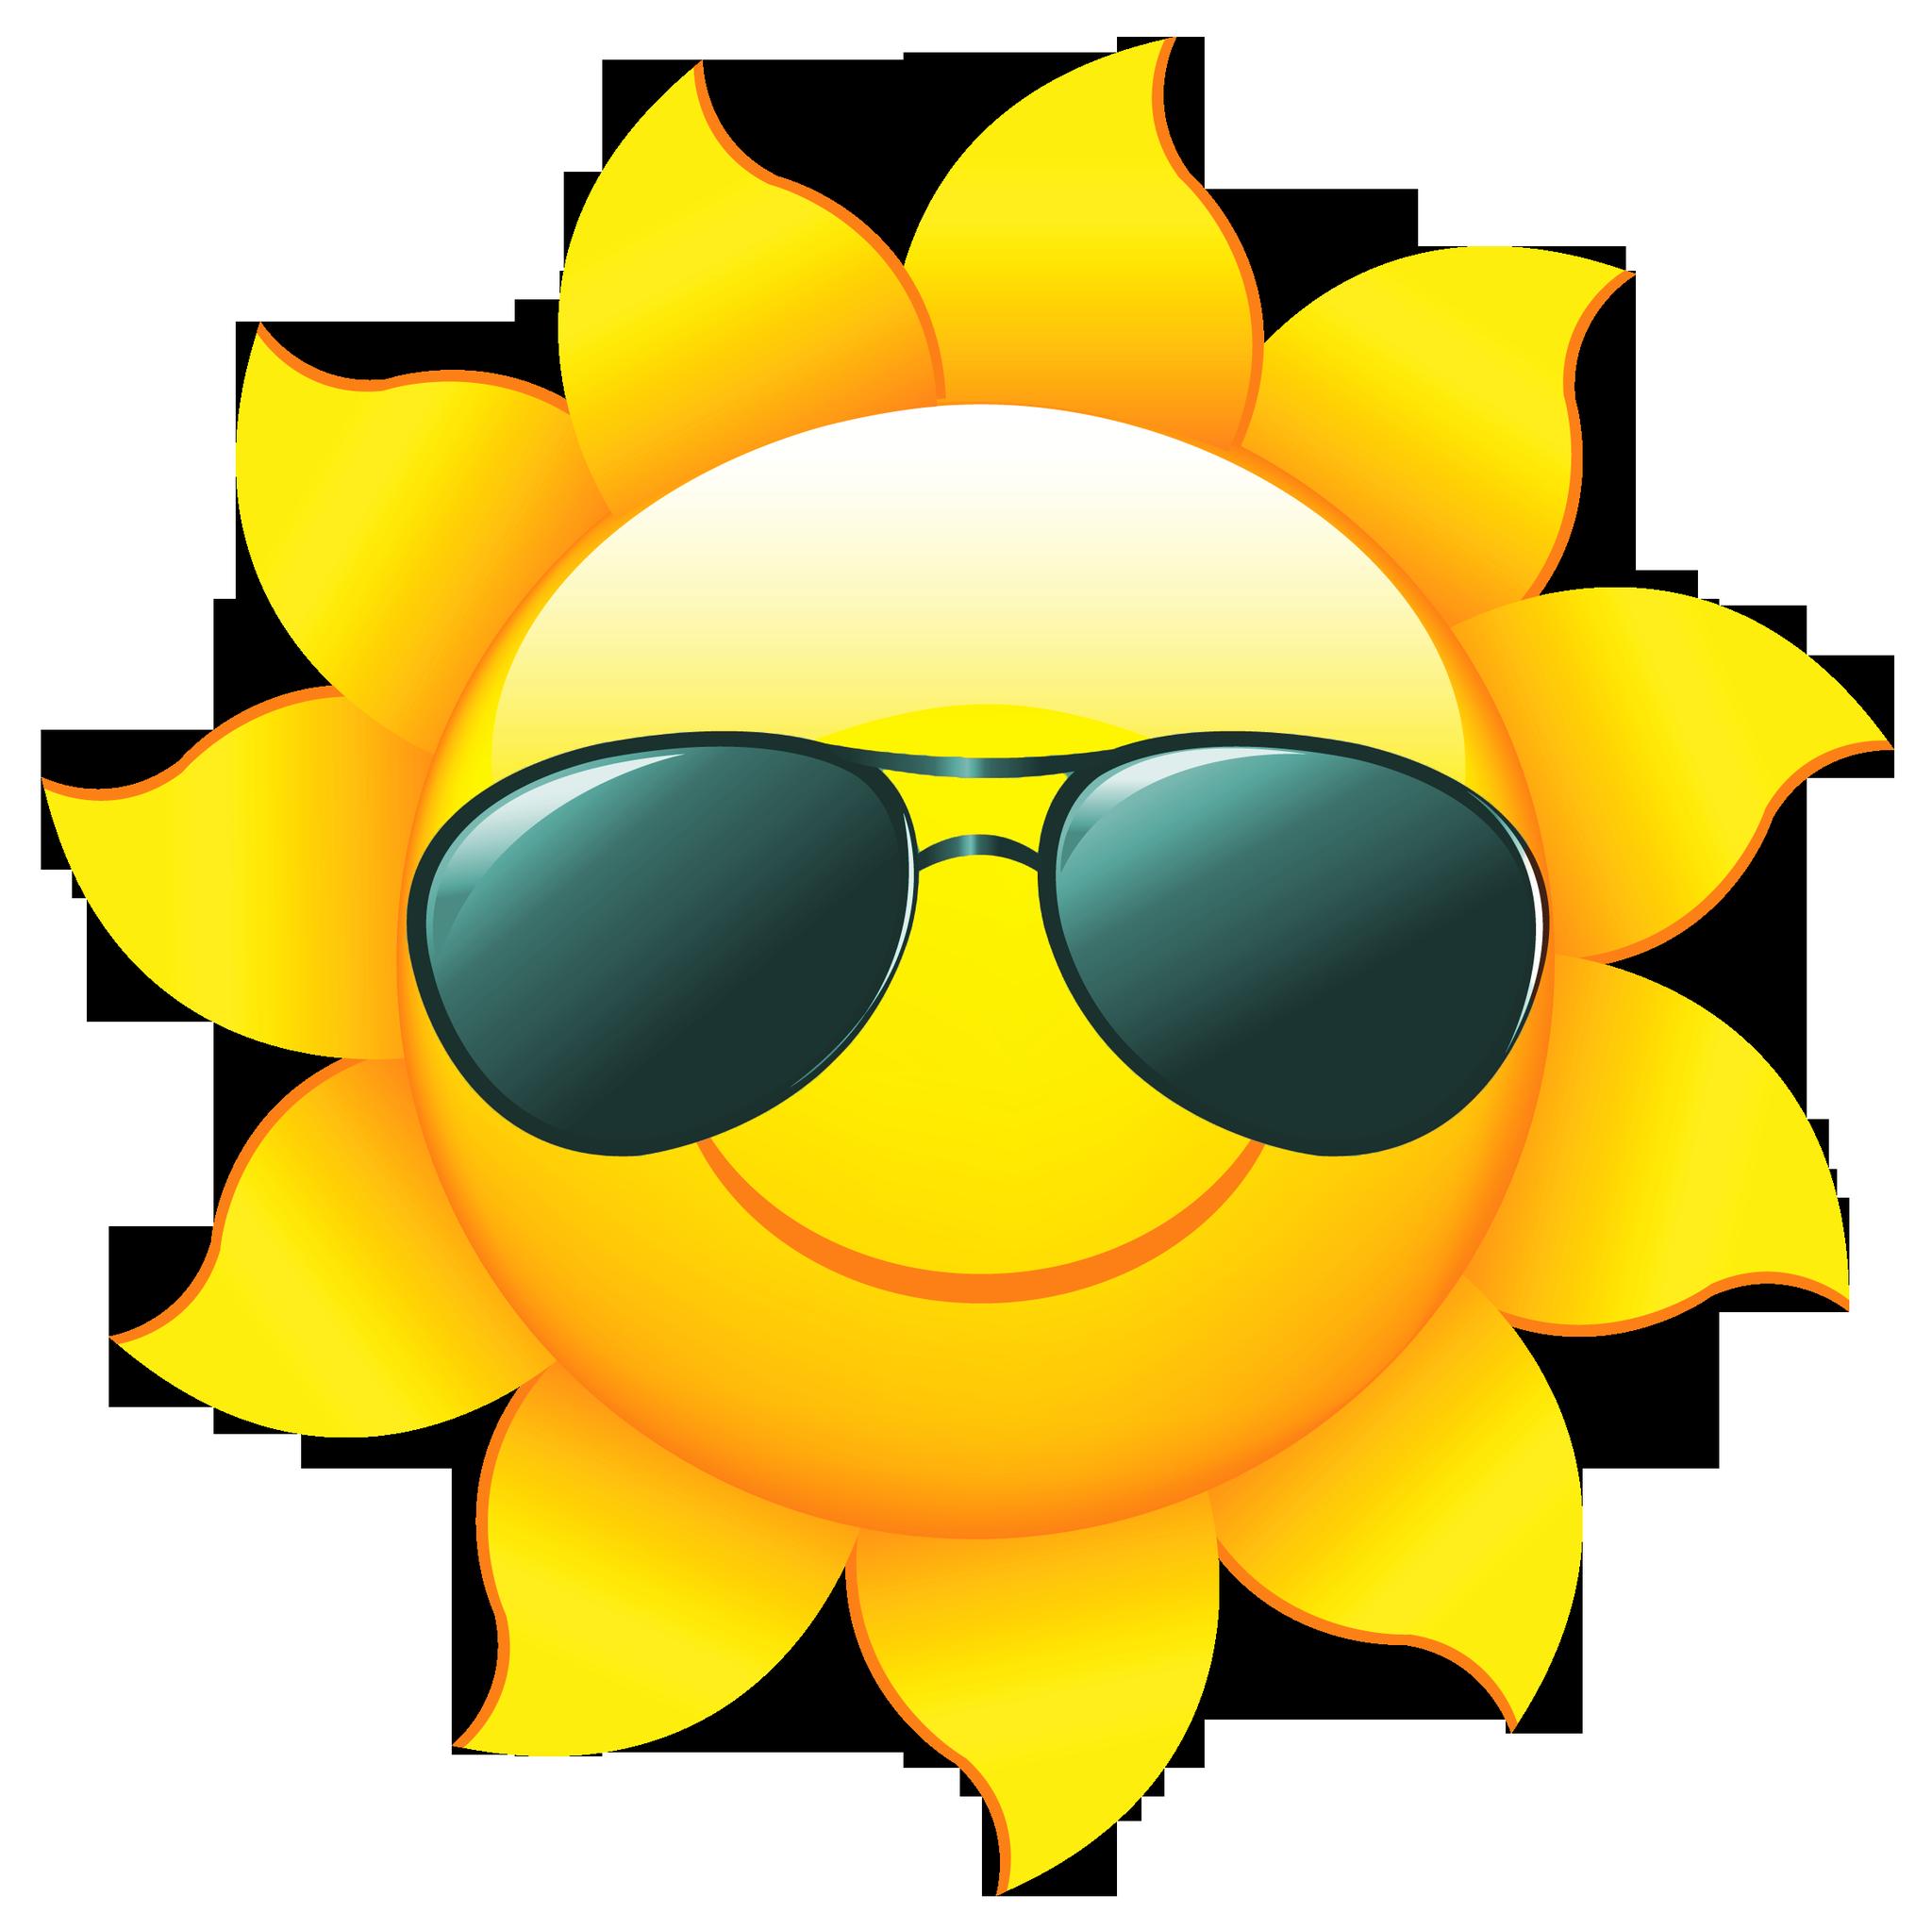 Clipart sunshine yellow sunburst. Trading standards on twitter